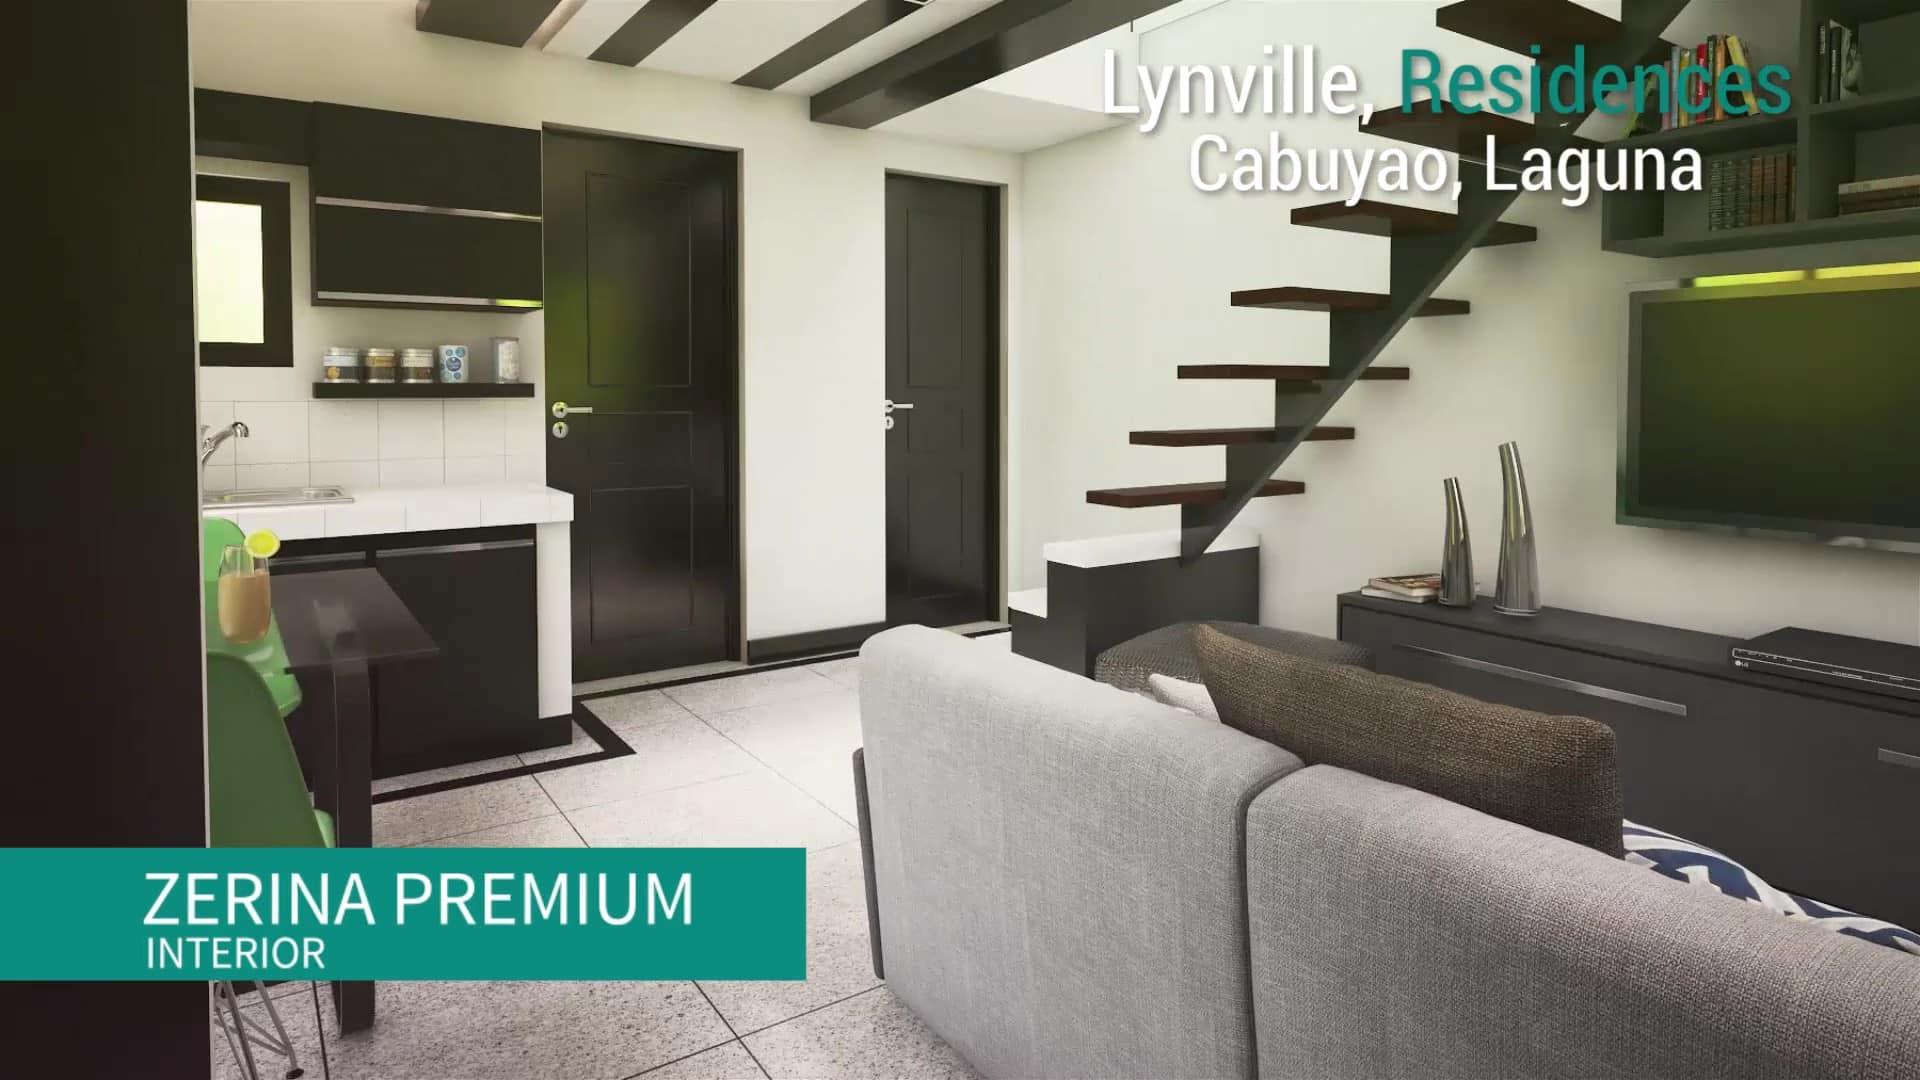 Lynville Residences Cabuyao Laguna Pagibig Affordable Homes